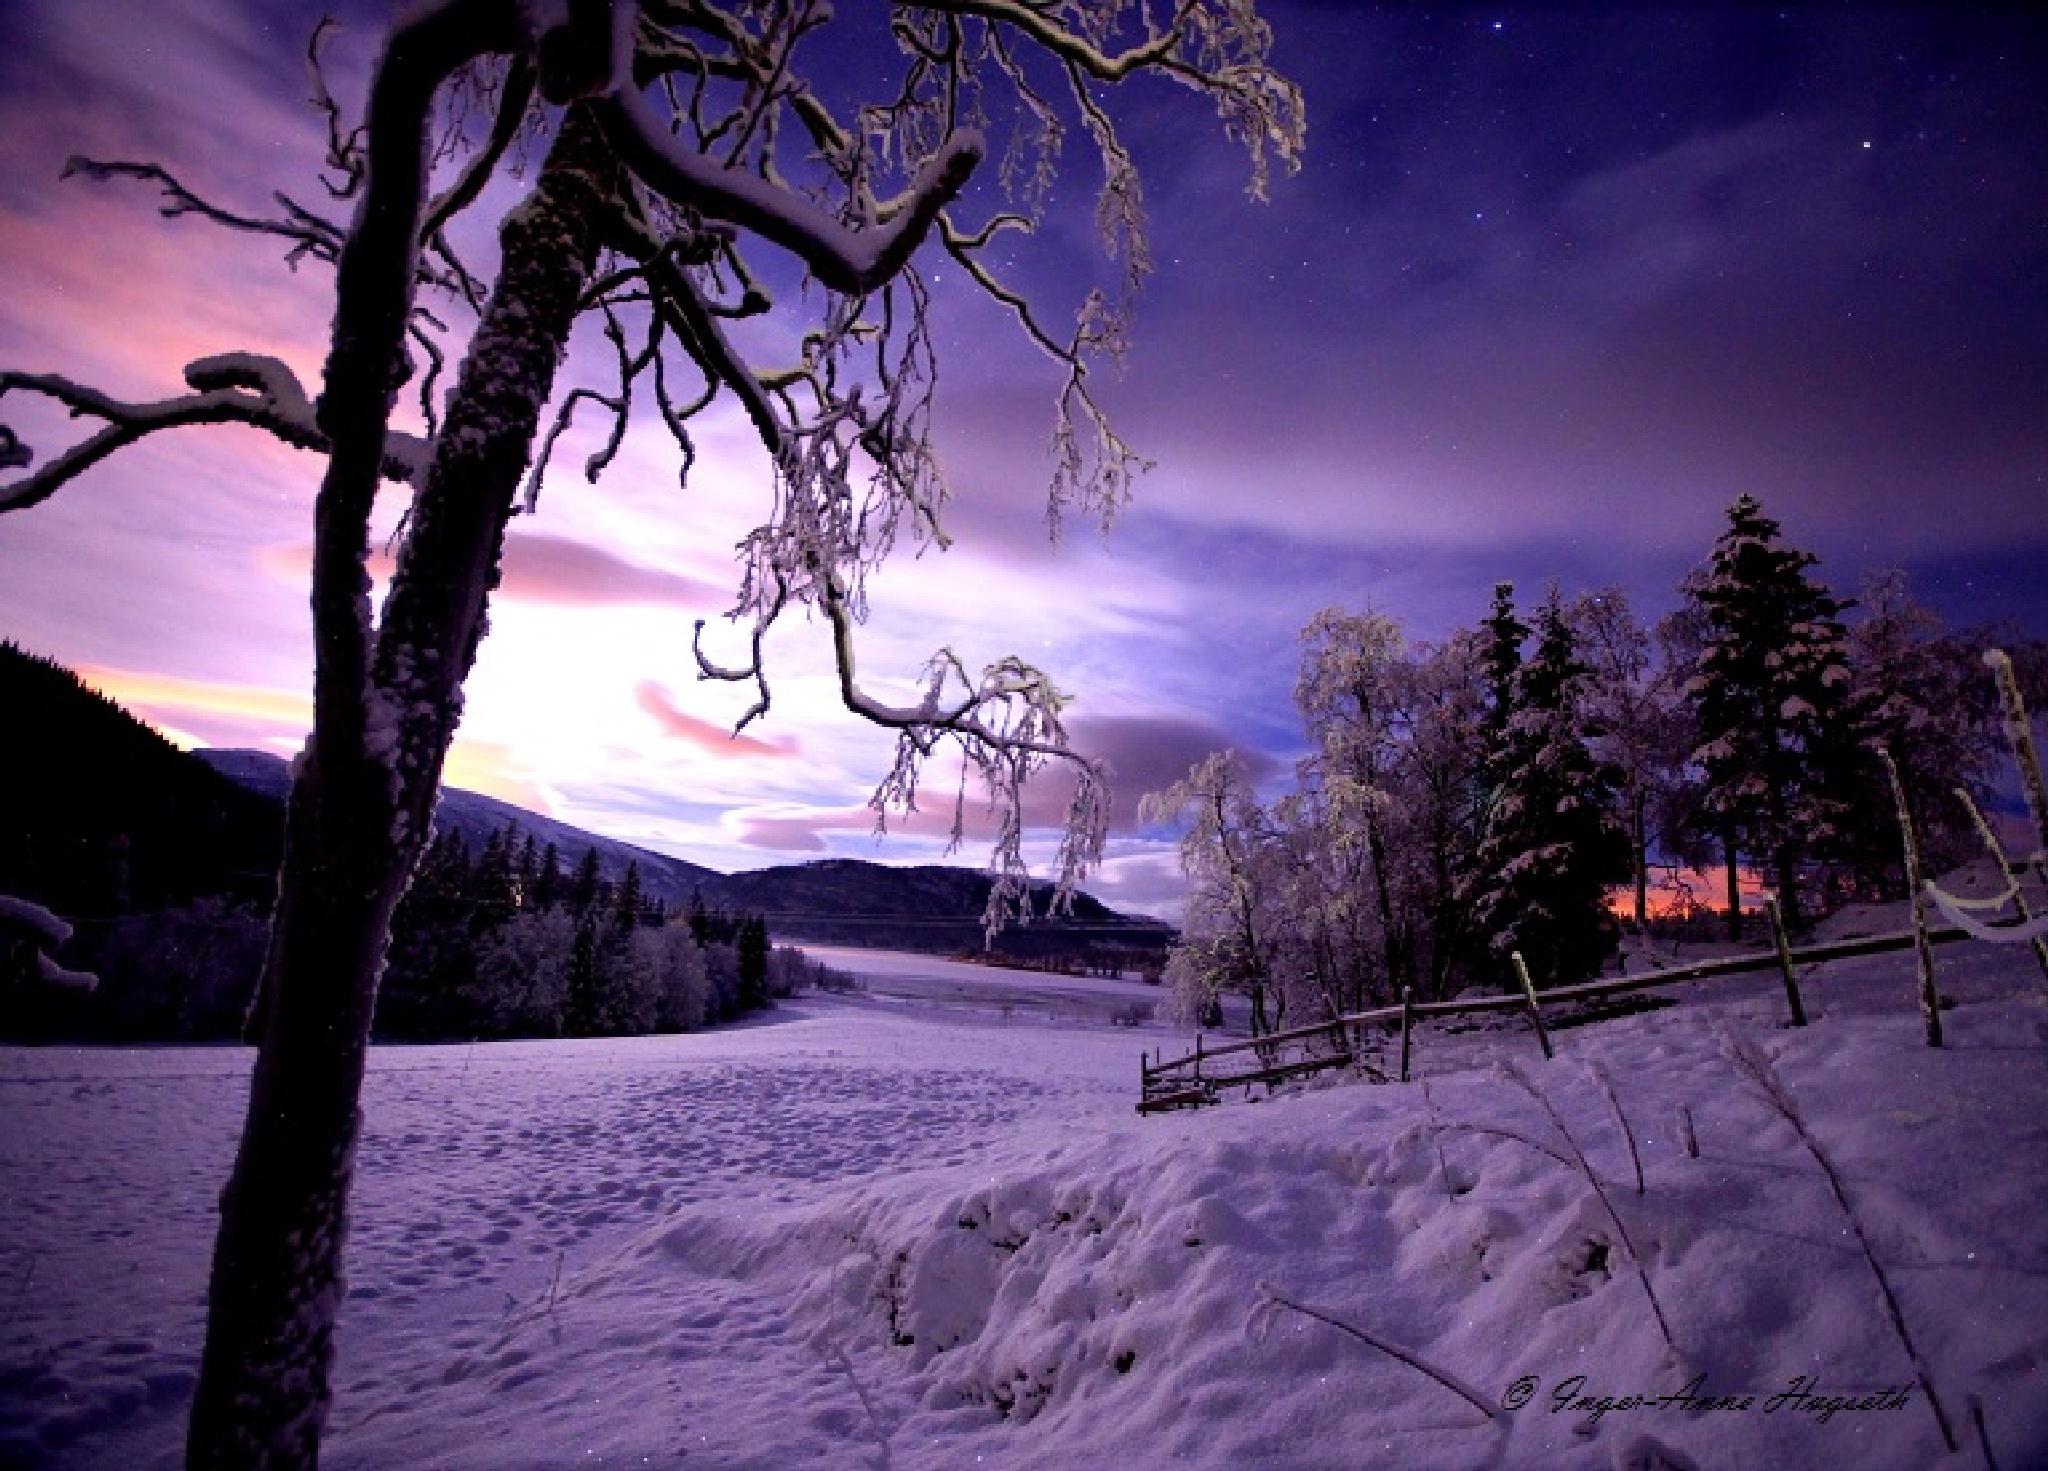 Decemberlight by IngerAnneHogseth